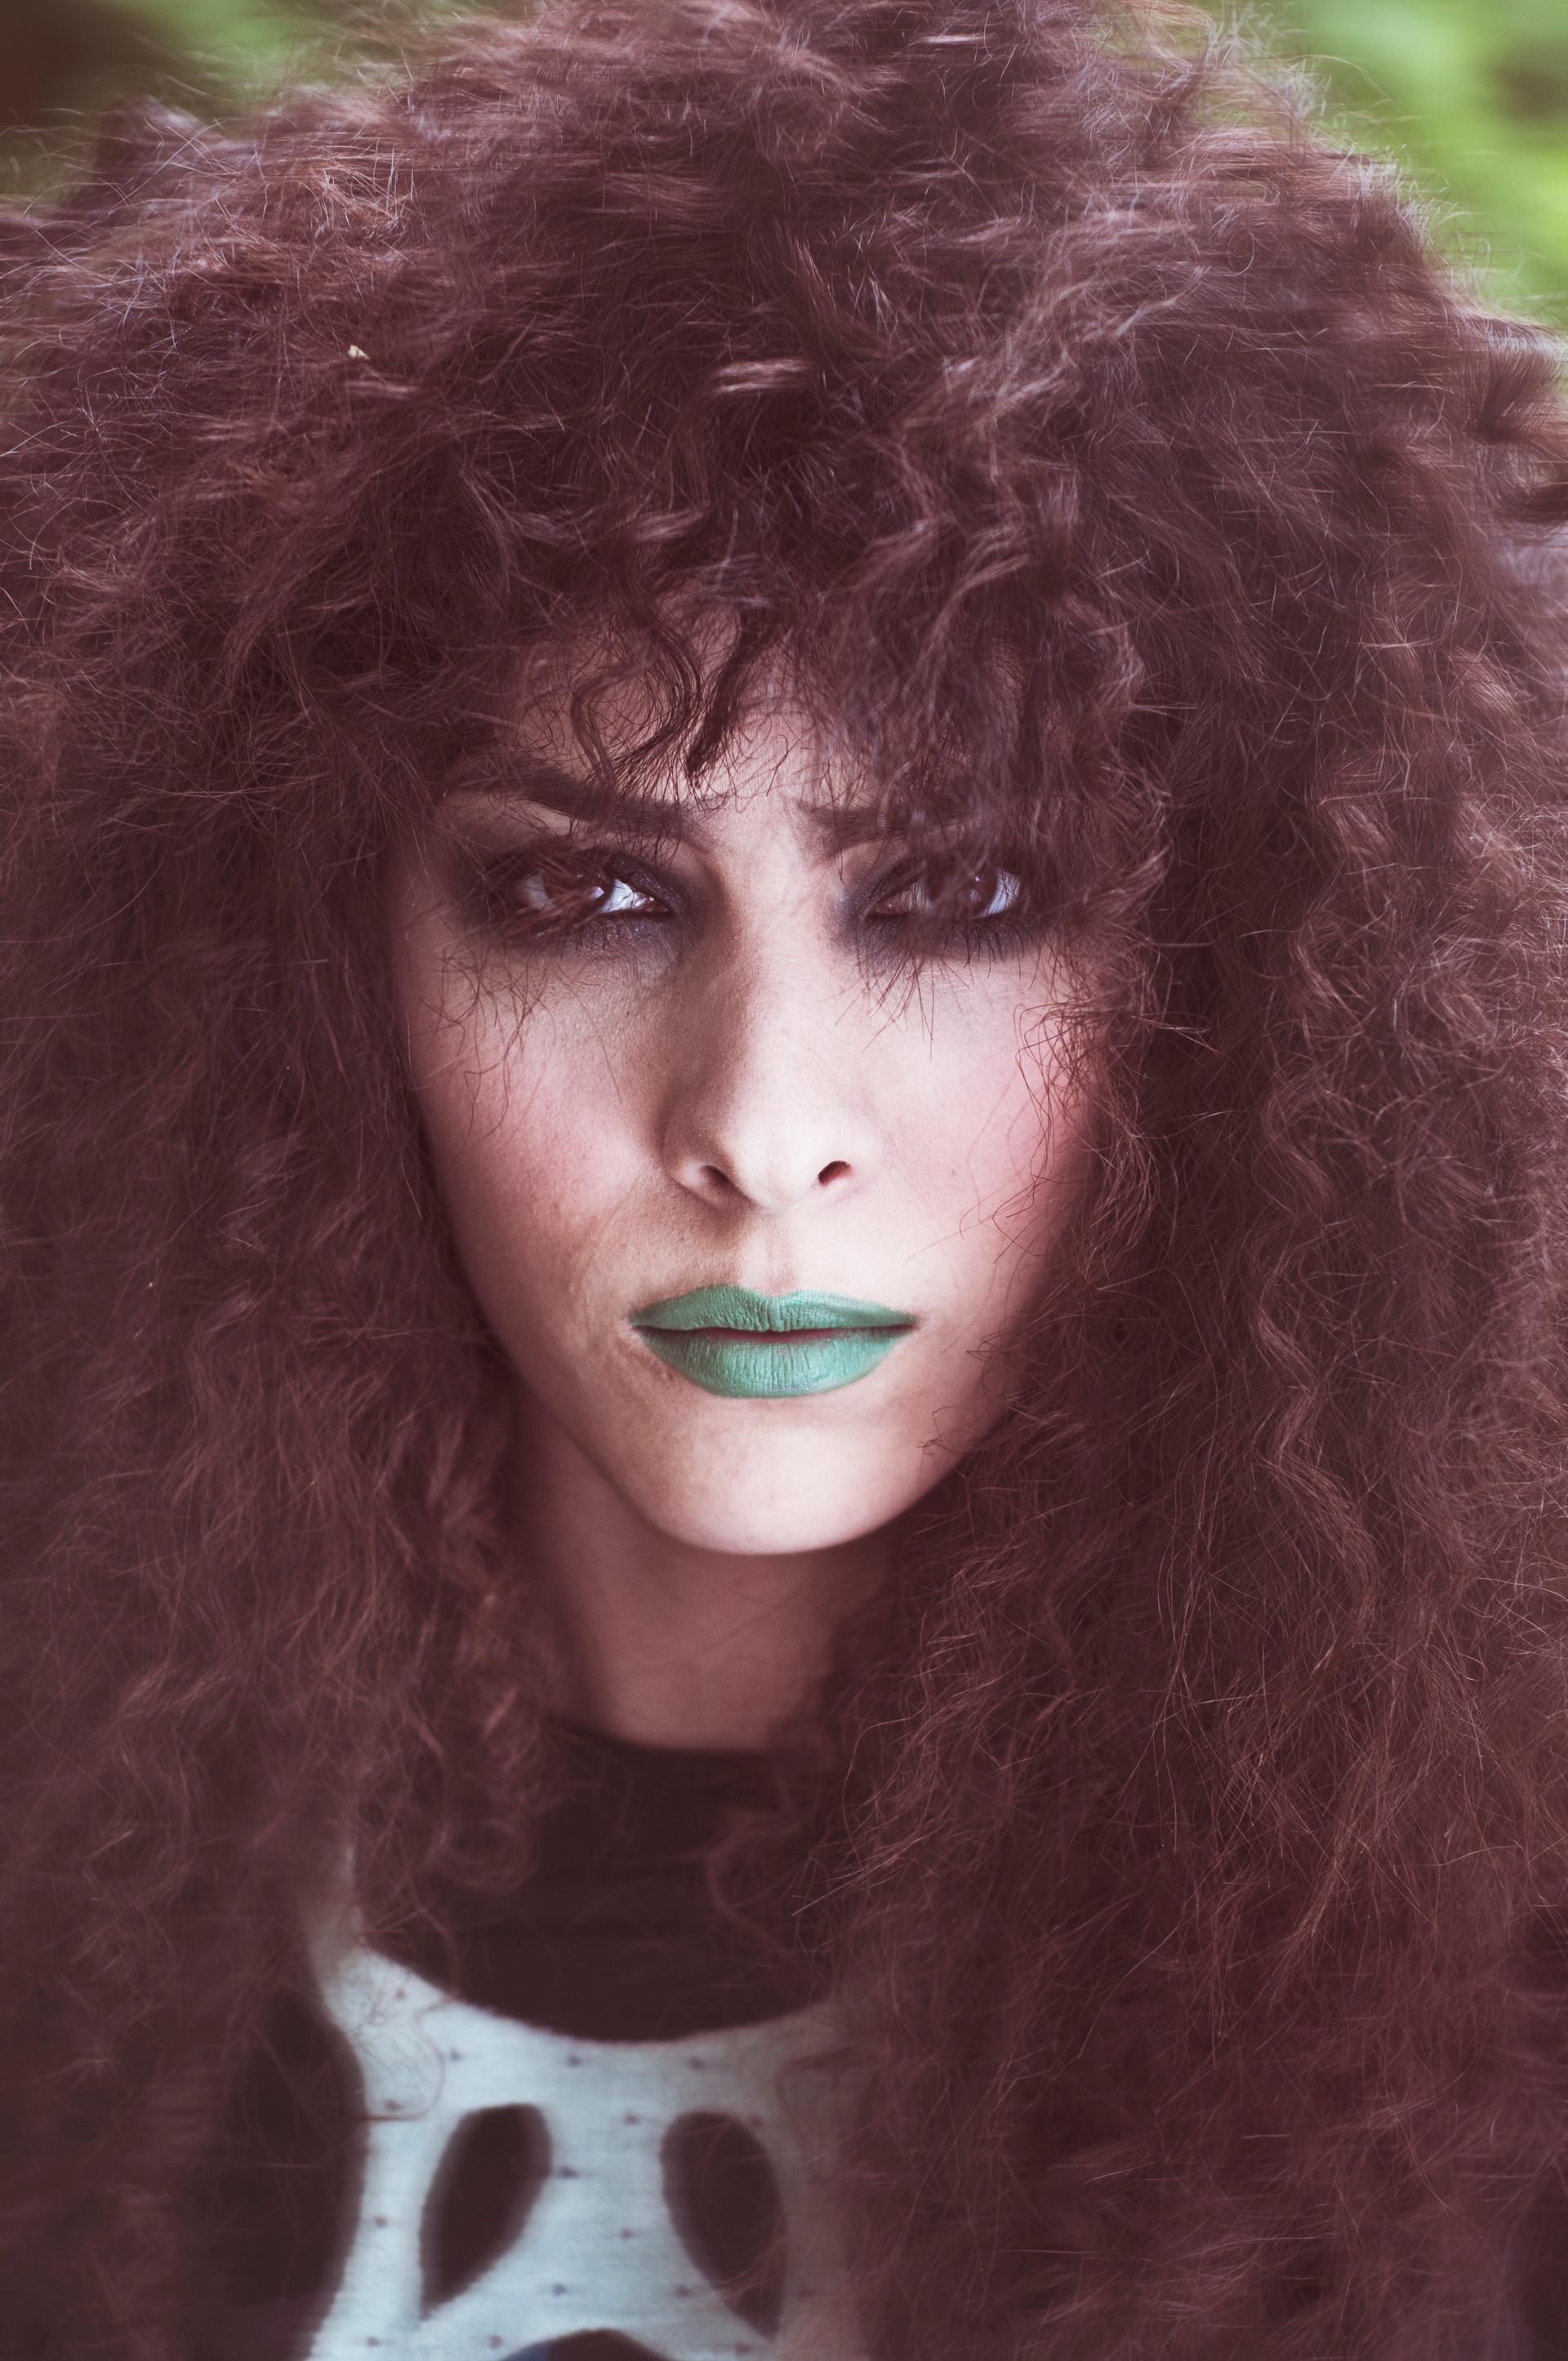 Photo: Martin Janssen Make-up & Hair: Jeanette Waasdorp Designer: Hester van Stoep